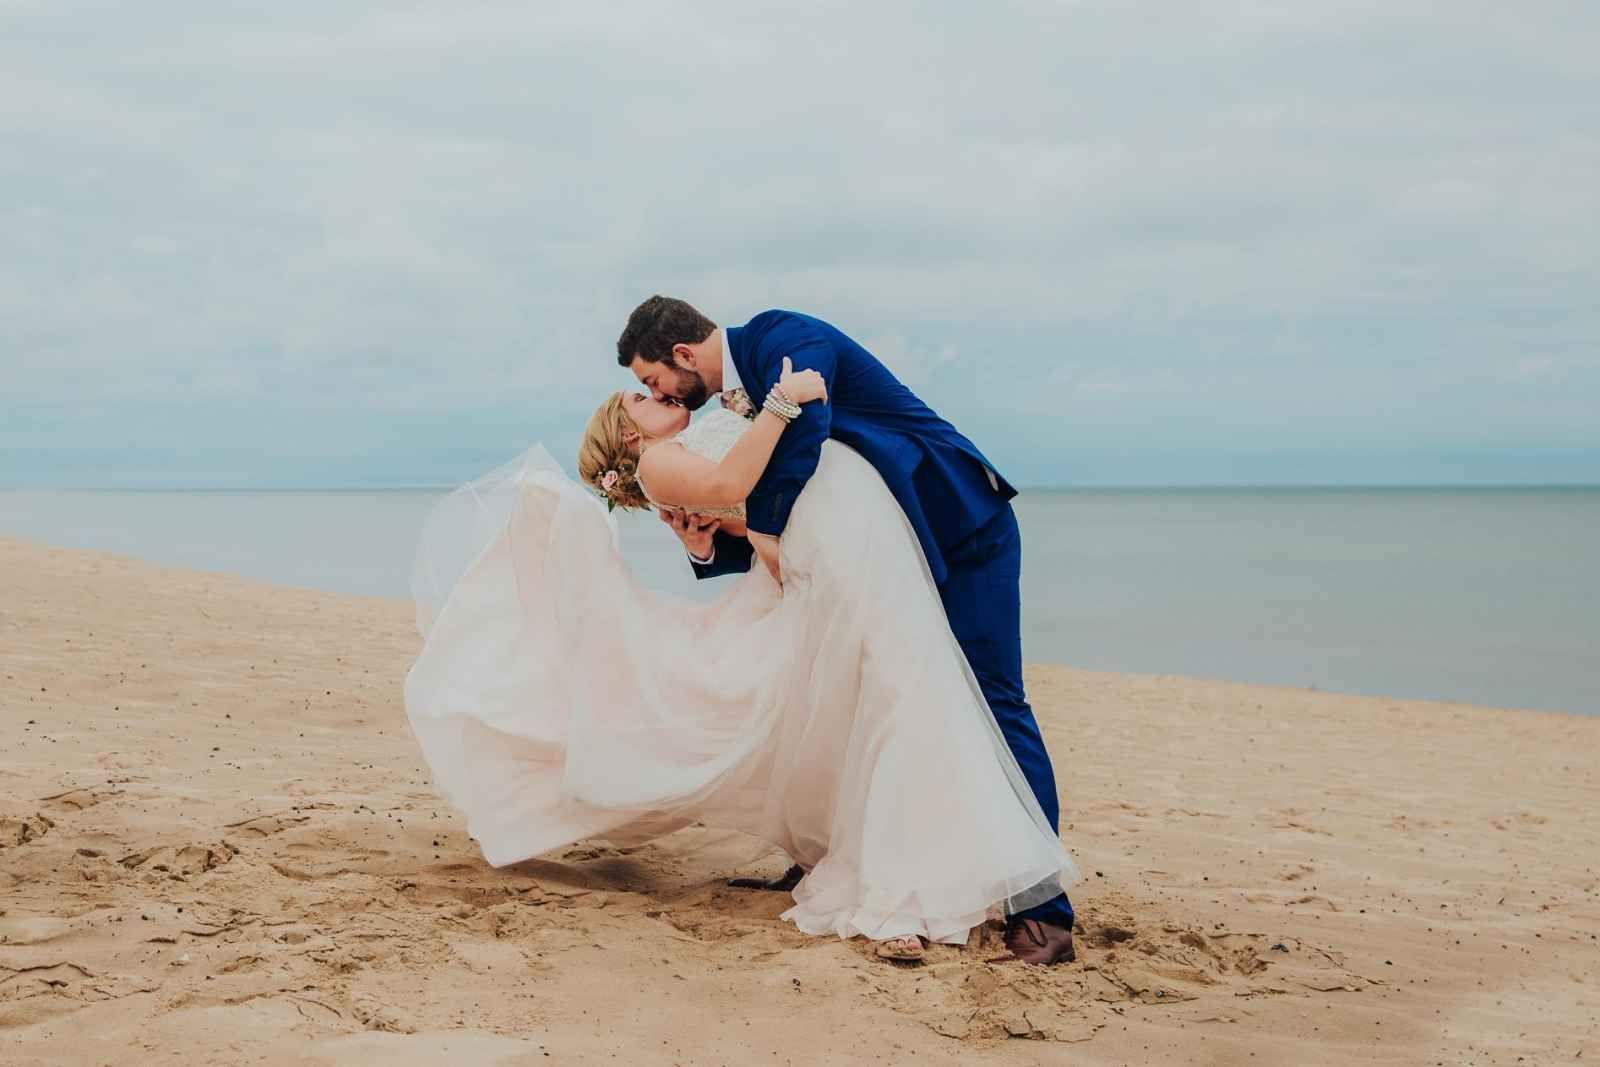 Allison williams wedding dress  Beach wedding photography  Our Favorite Instagram Posts